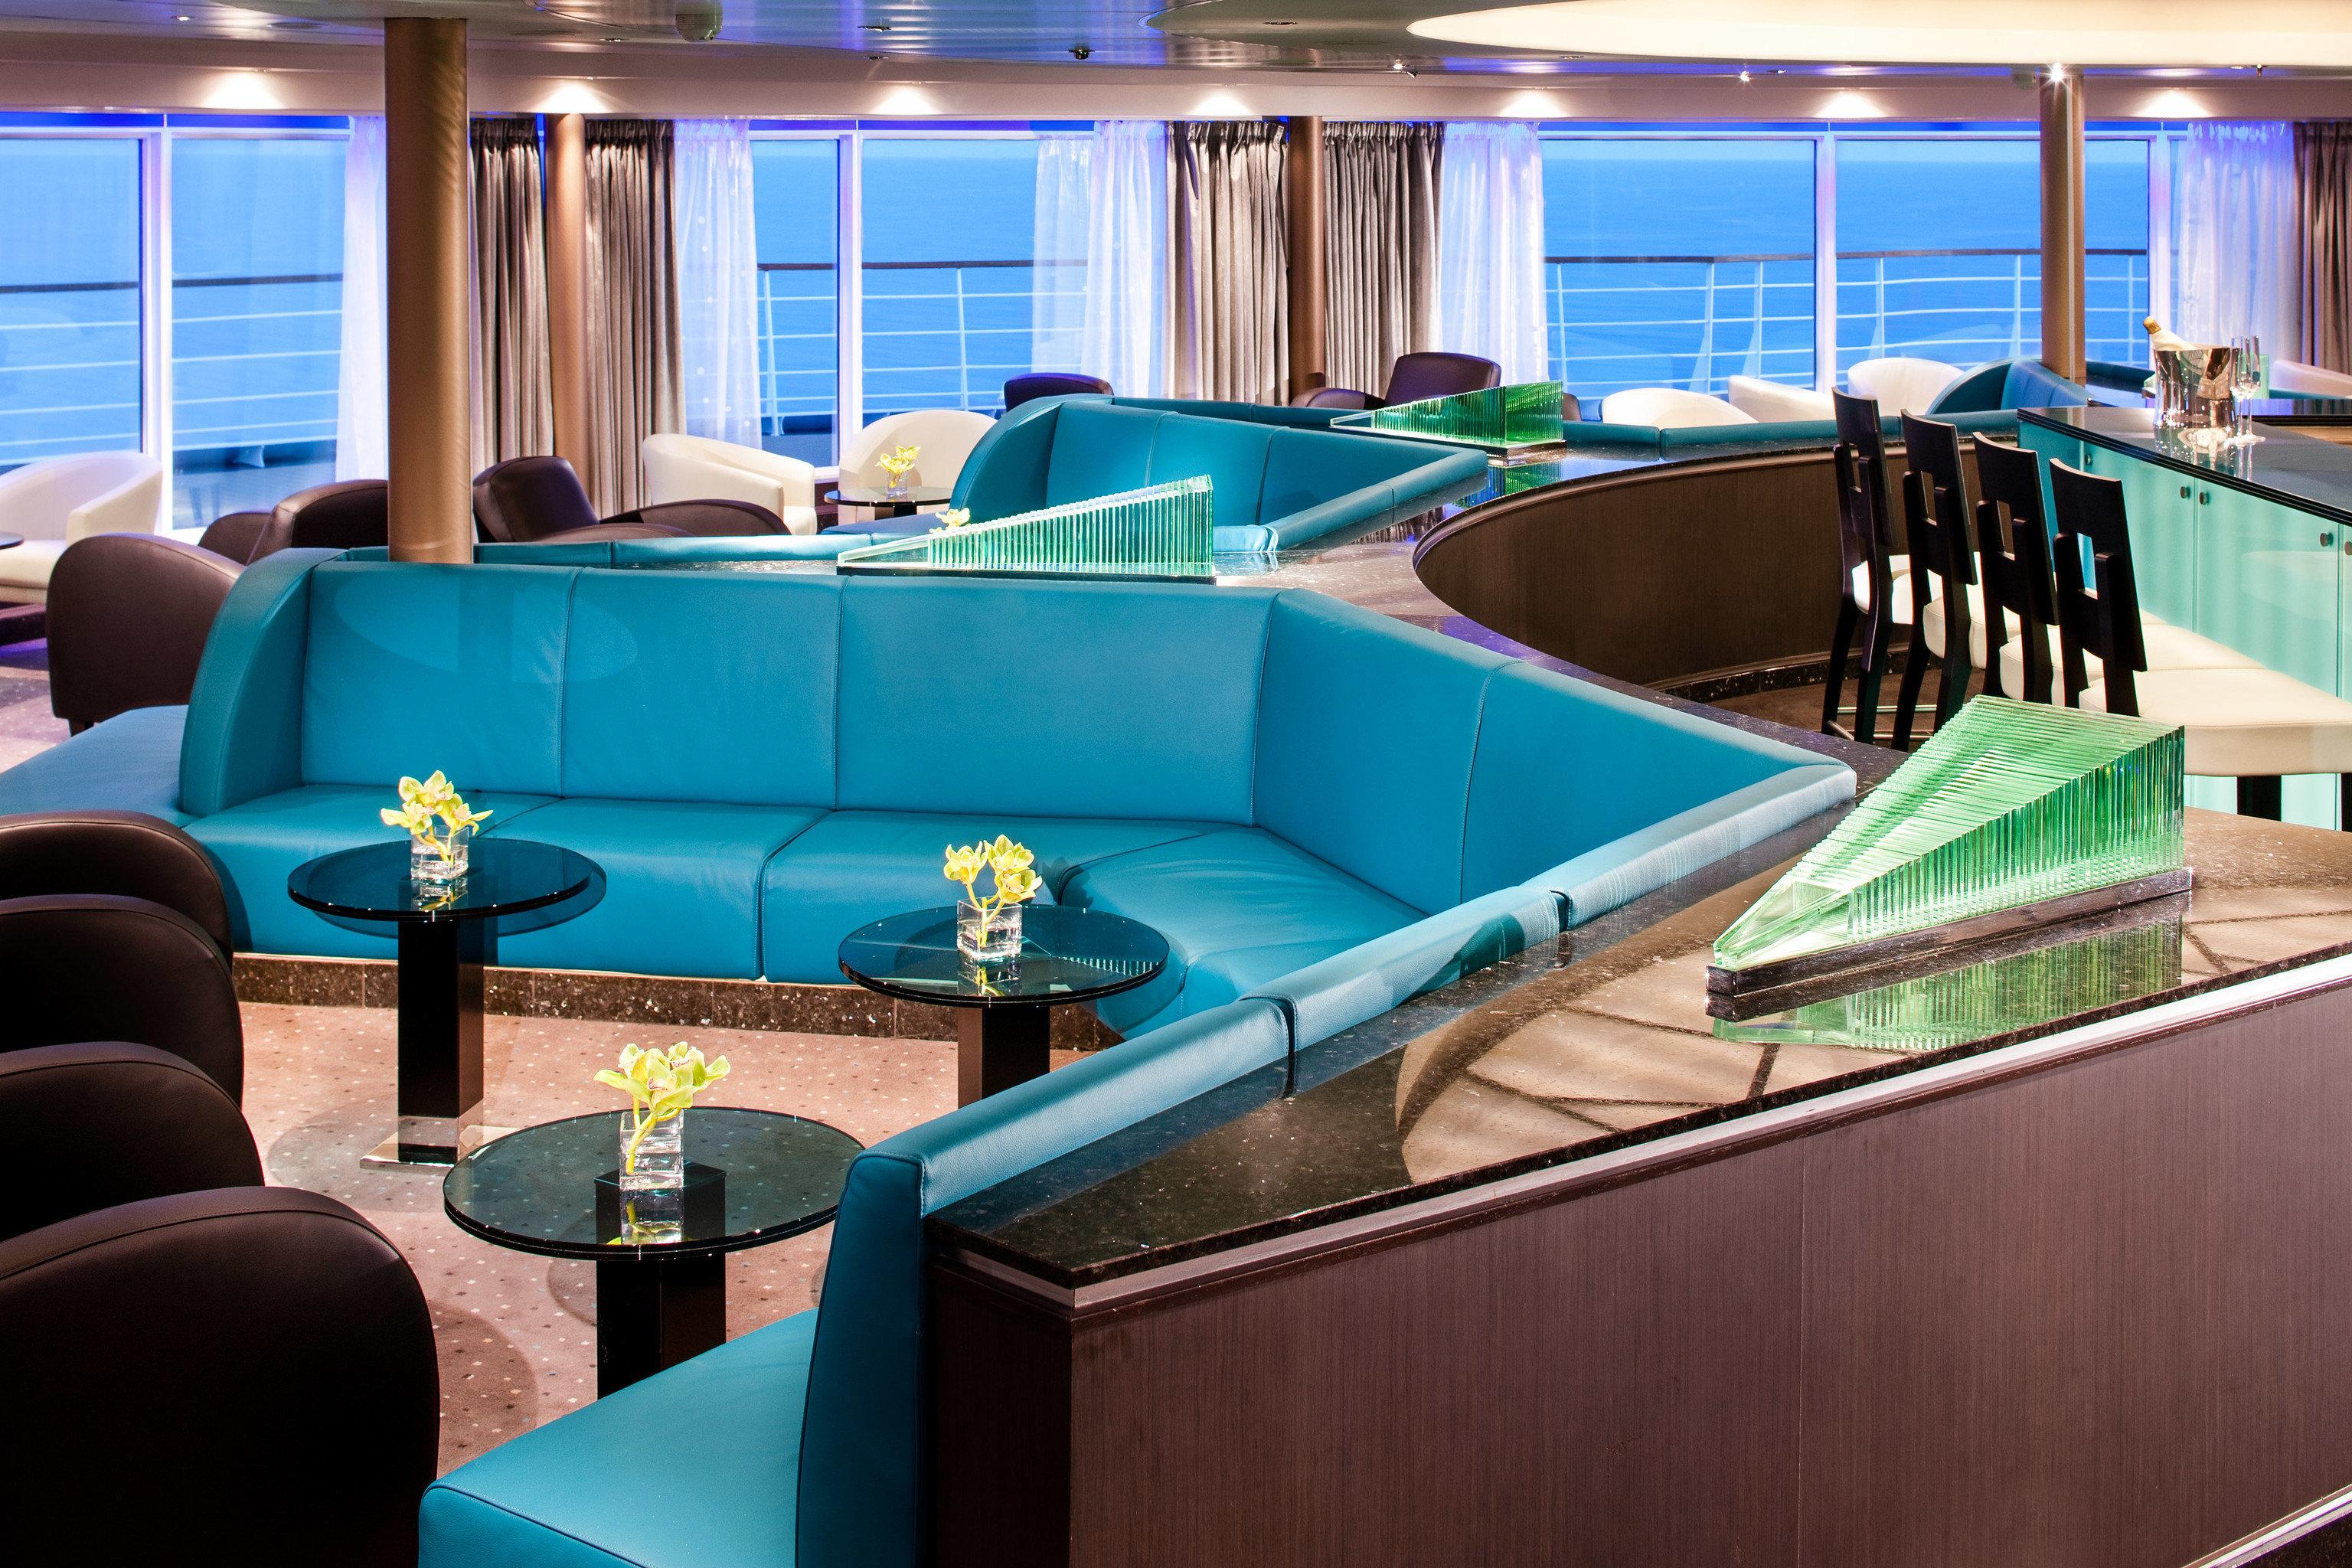 Cruise Travel Luxury Travel Trip Ideas window indoor table chair floor swimming pool leisure Pool leisure centre interior design recreation room furniture